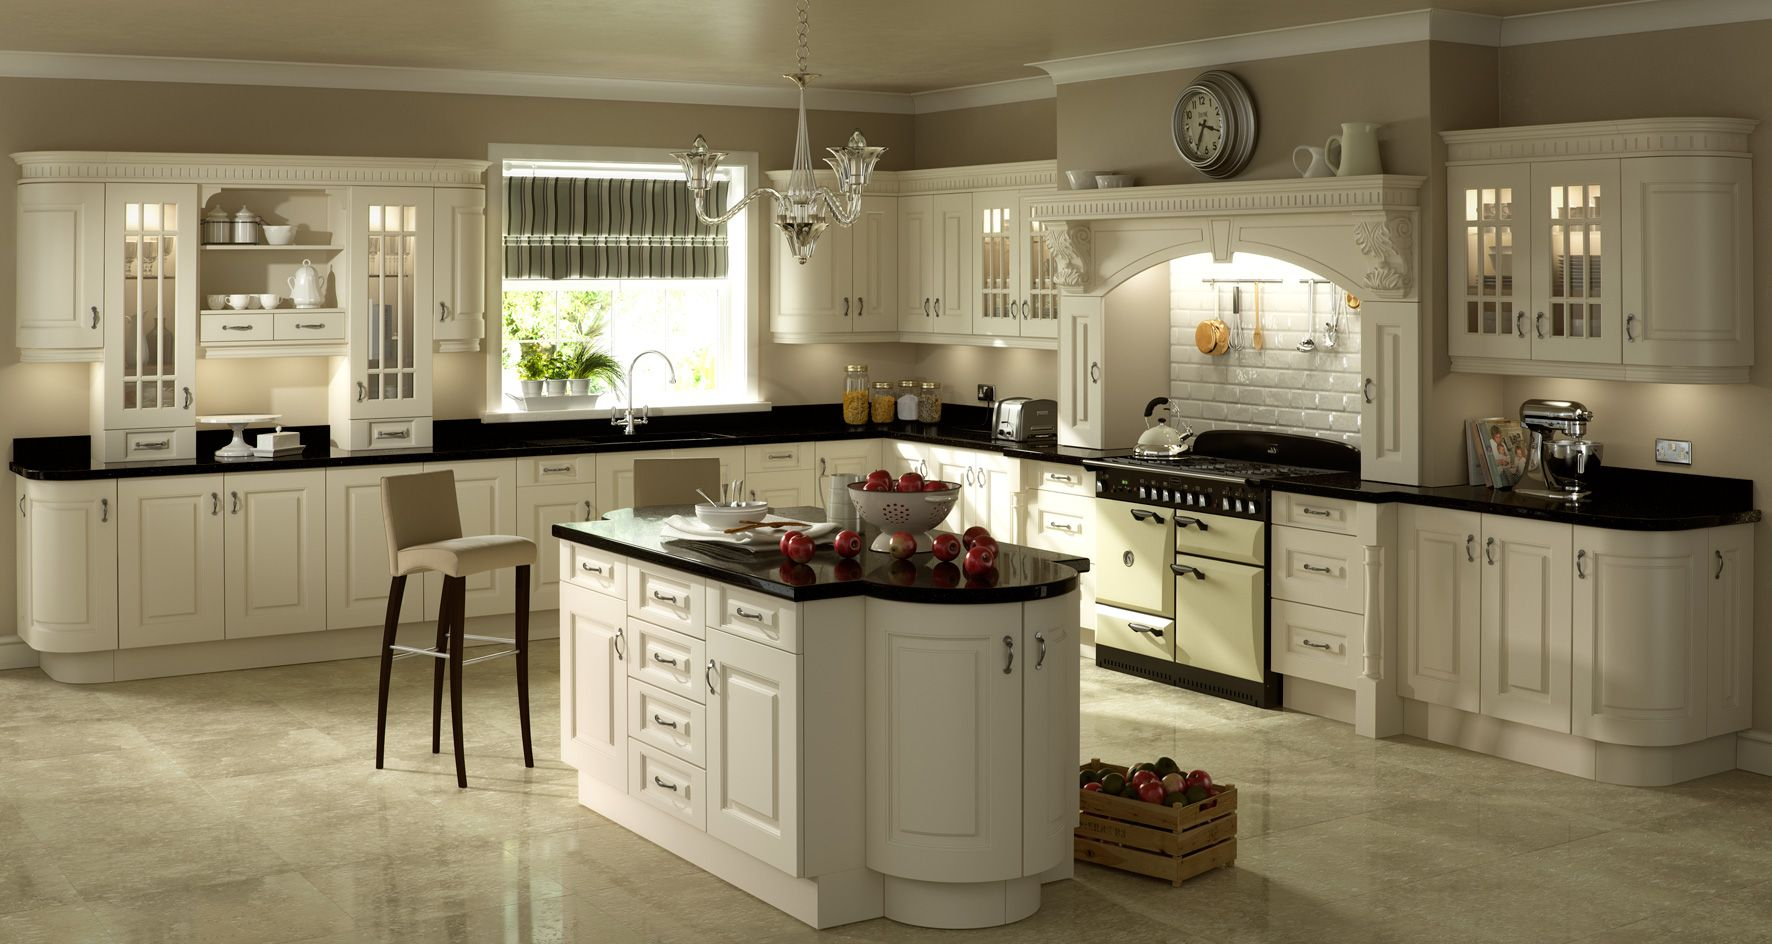 Nice Ivory Kitchens Design Ideas Part - 2: Ivory Cabinets With Black Appliances · German KitchenPainted  DoorsTraditional KitchensKitchen DesignsKitchen IdeasIvory ...